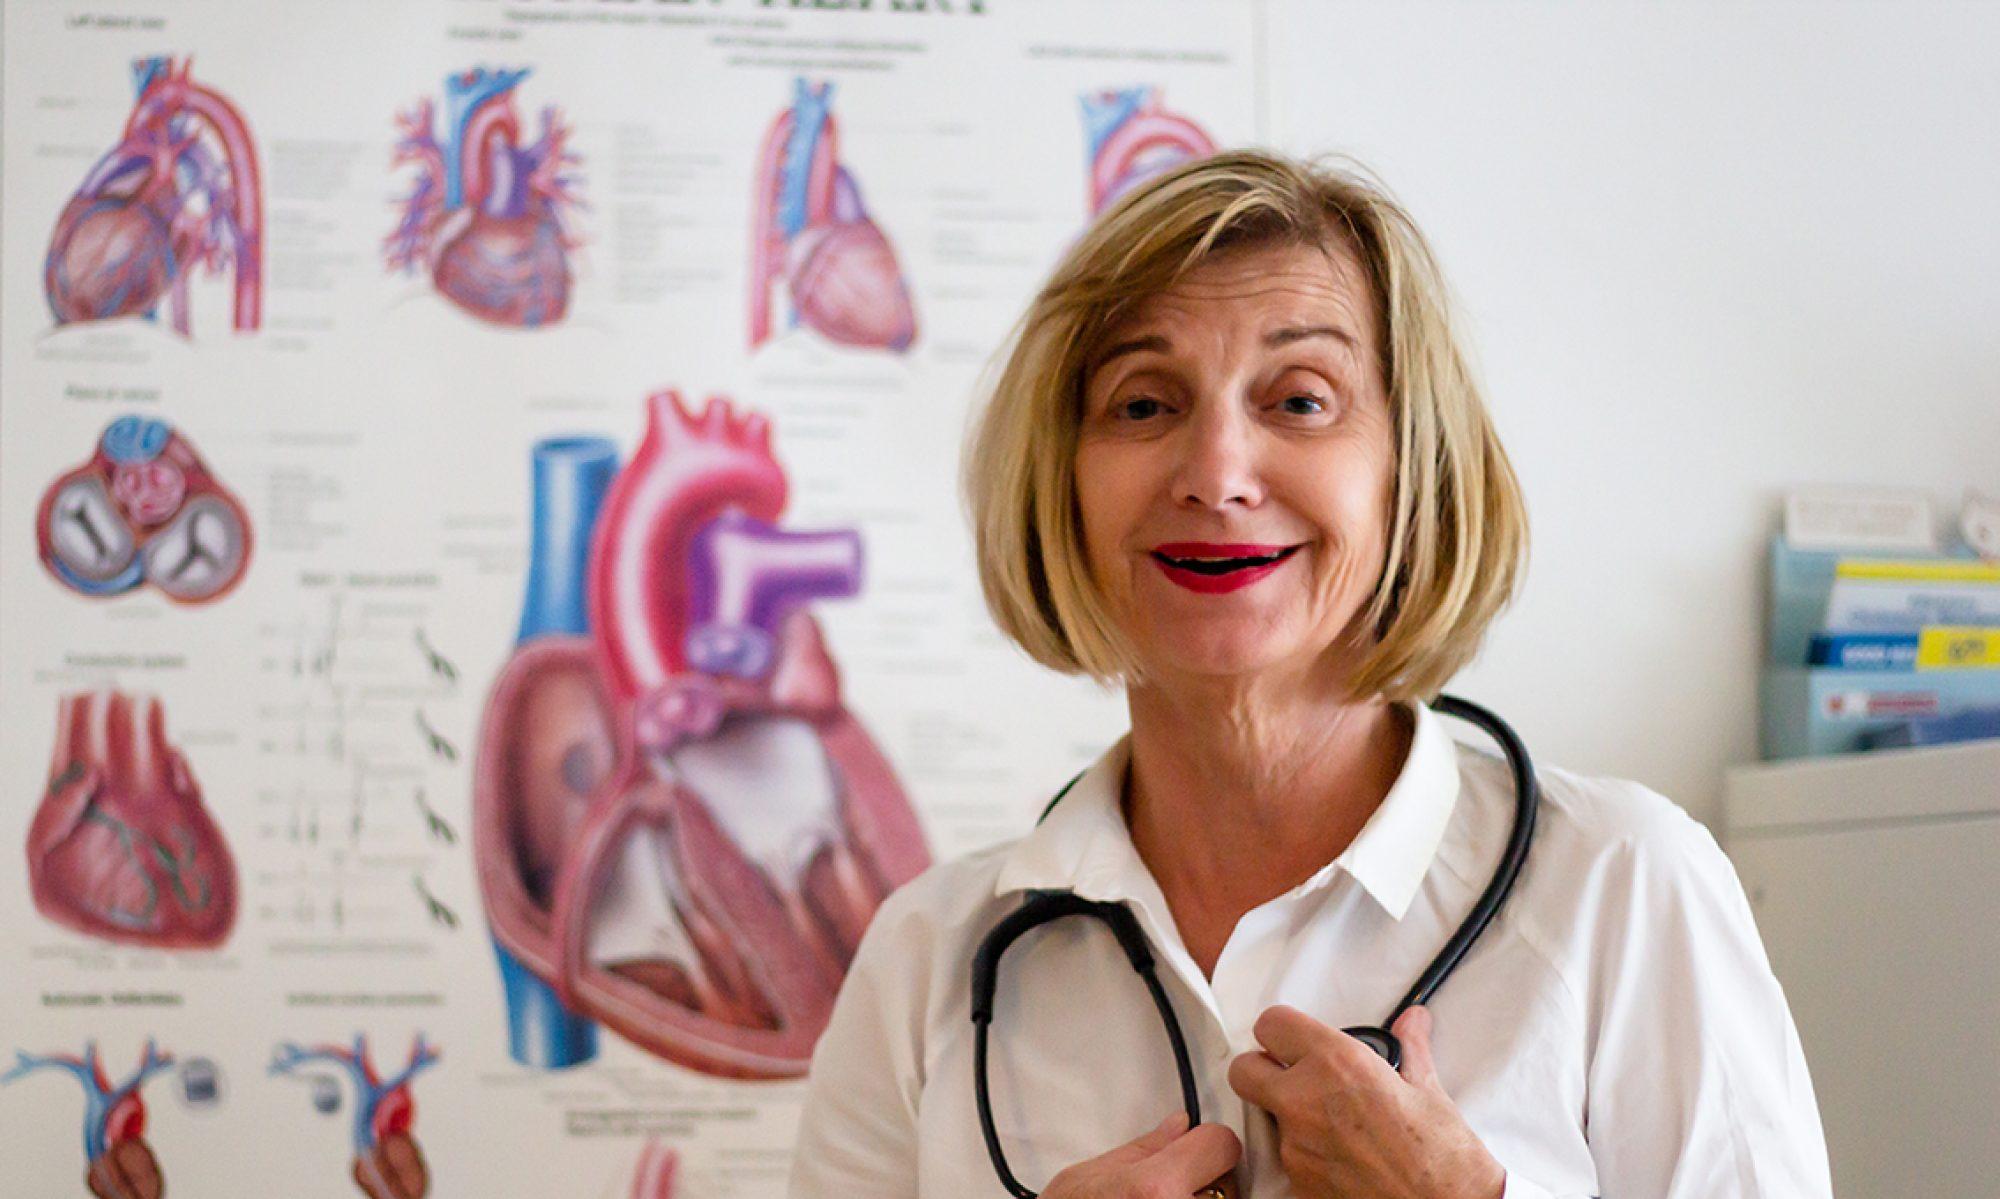 Univ. Prof. Dr. Andrea Podczeck-Schweighofer